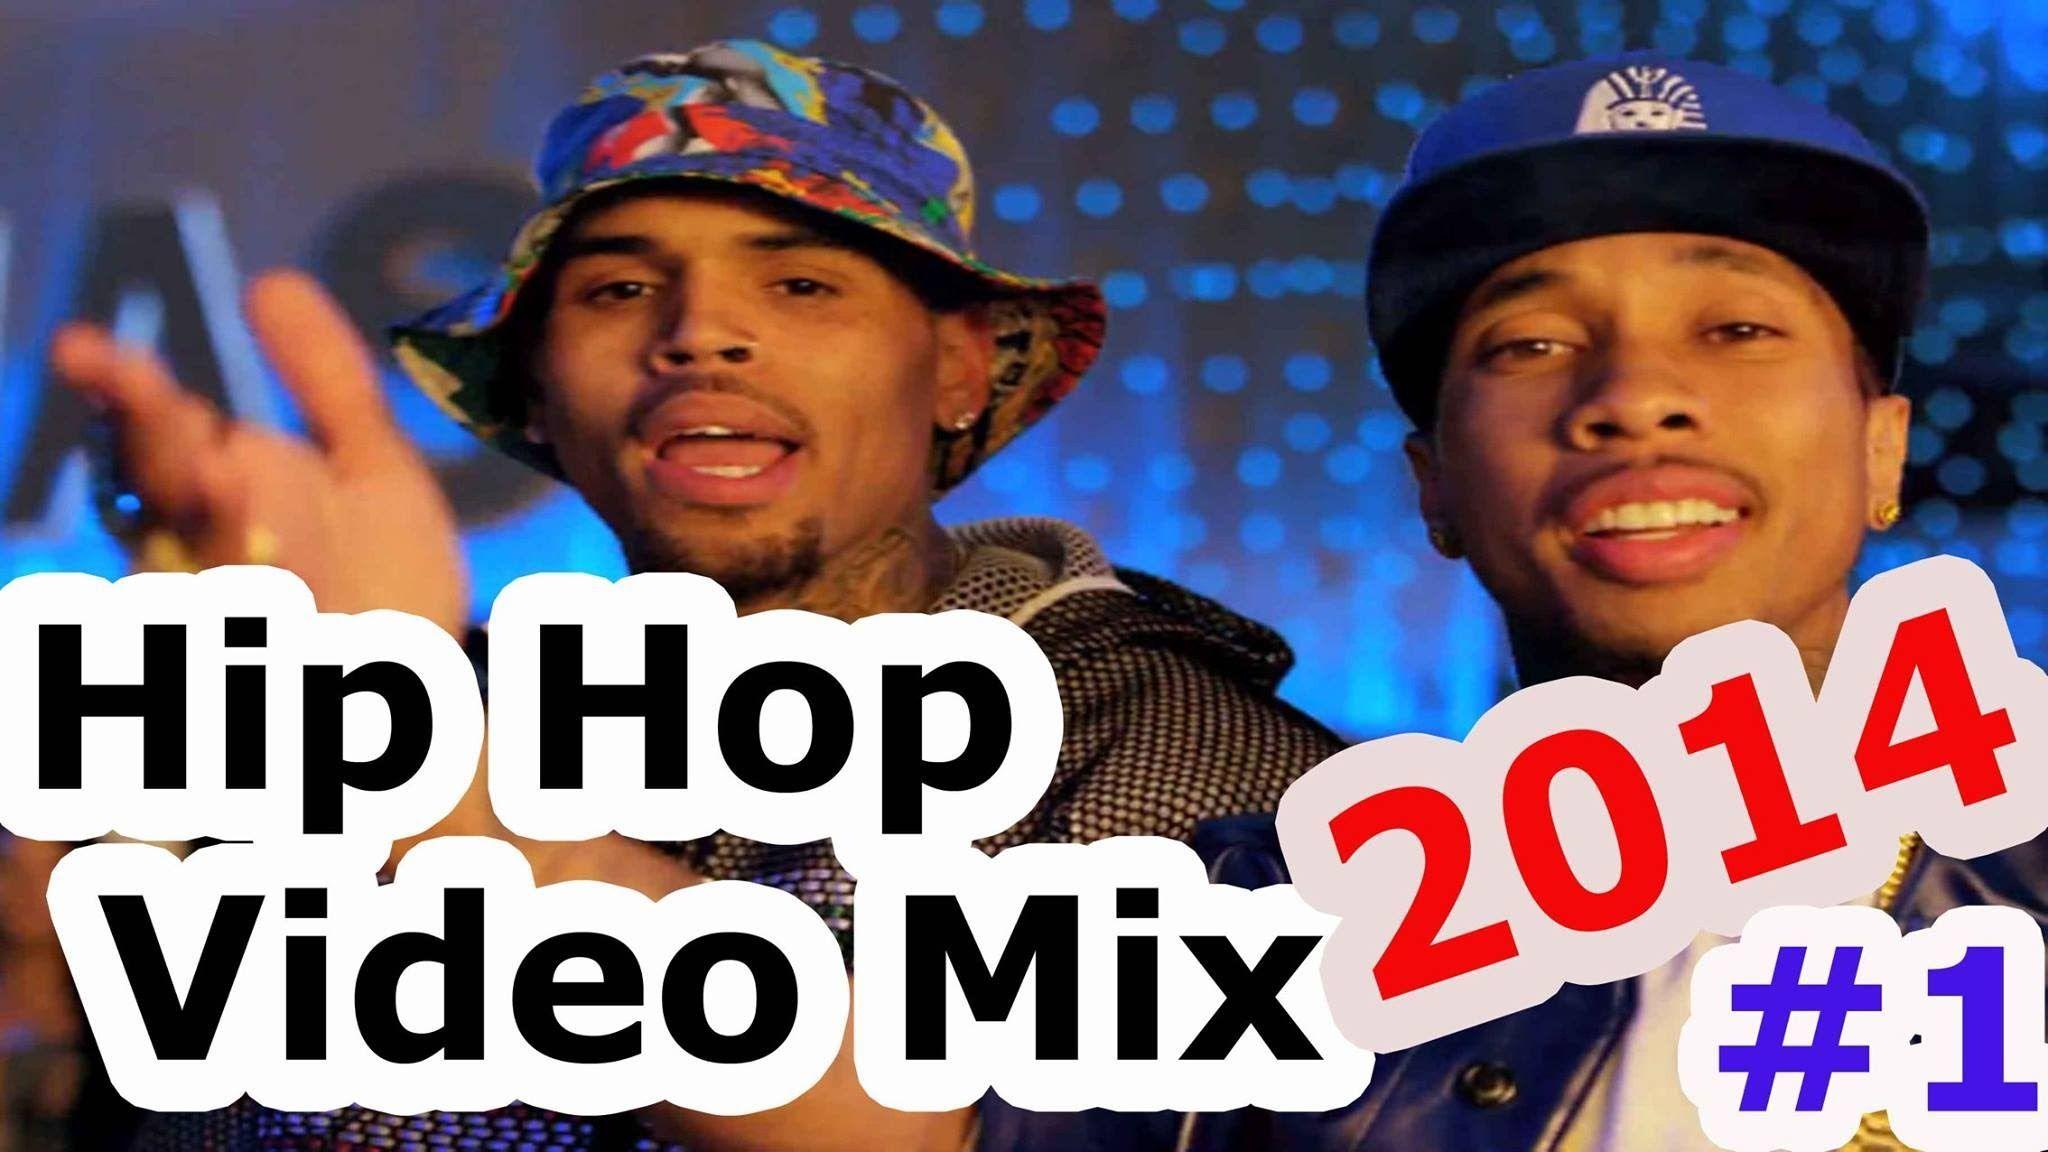 Hip Hop Rnb Club Twerk Black Video Mix 2014 #1 - Dj StarSunglasses